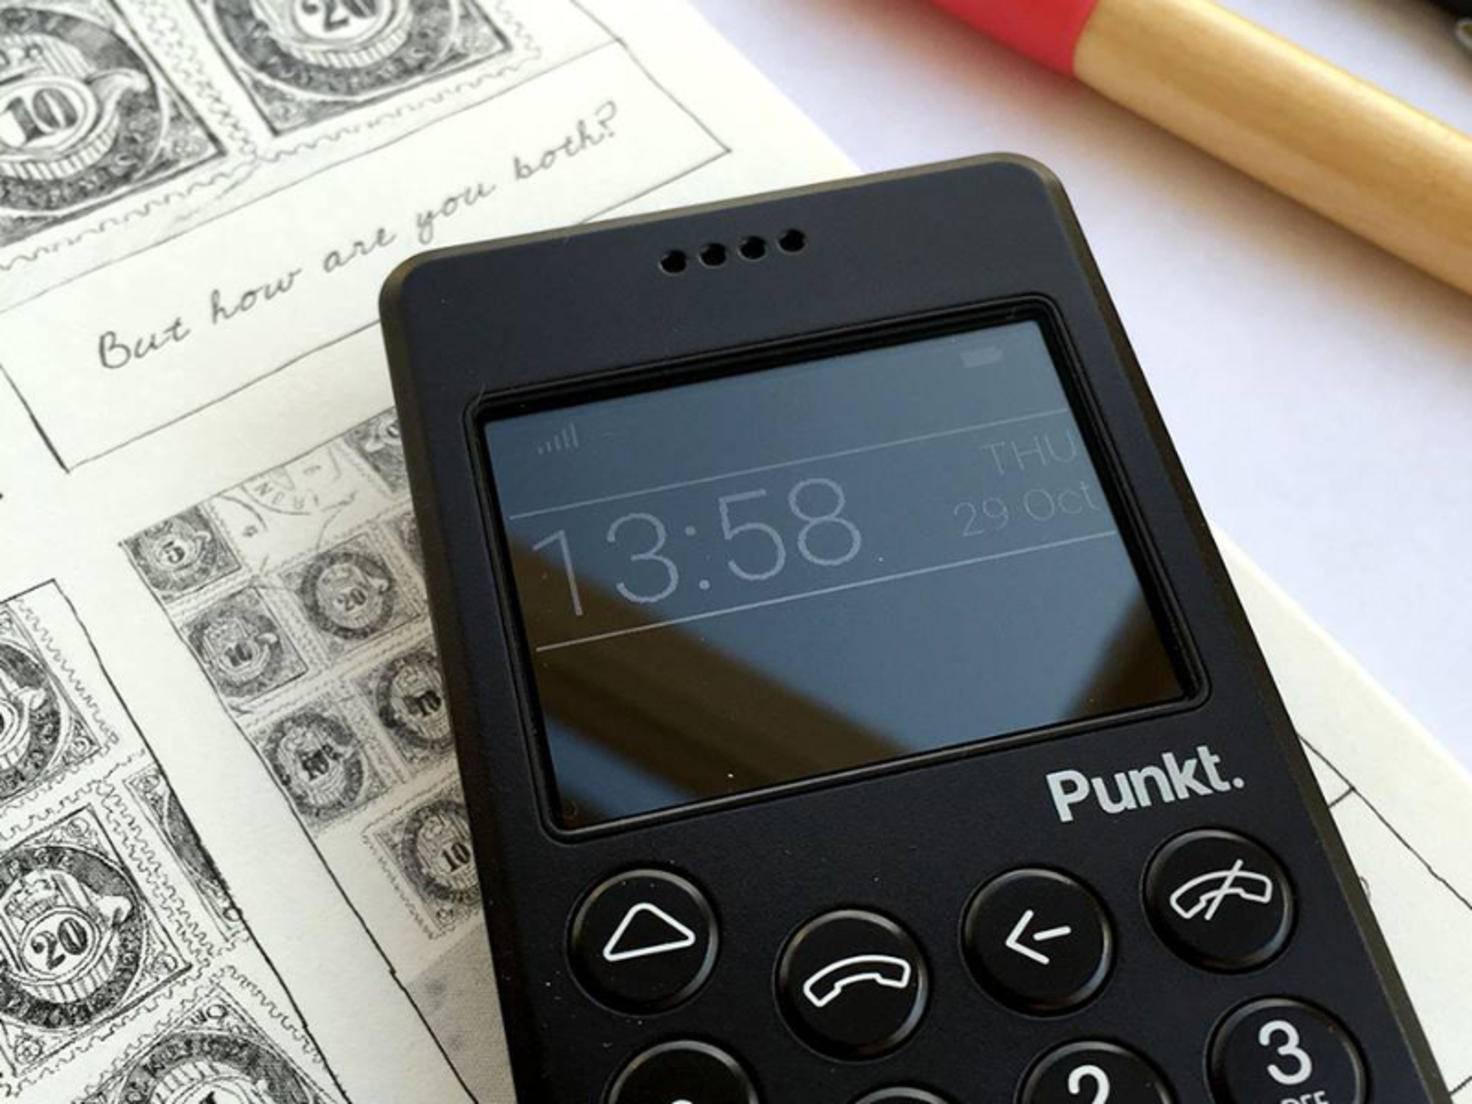 MP01 Mobile Phone